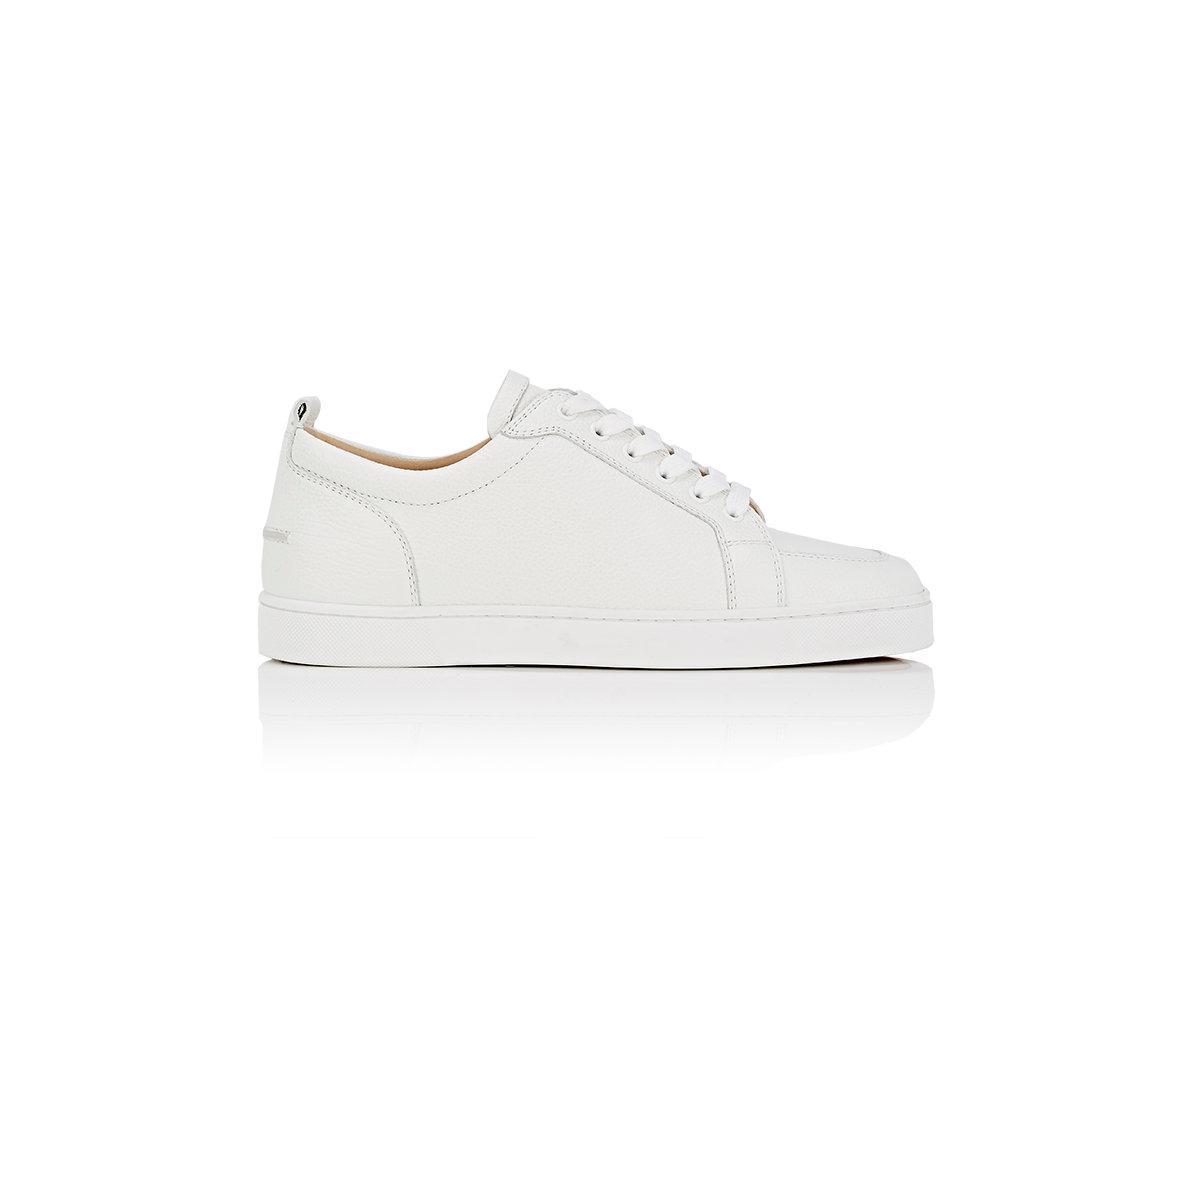 cacc9f9e2773 ... canada christian louboutin. mens white rantulow flat leather sneakers  7de89 d03c8